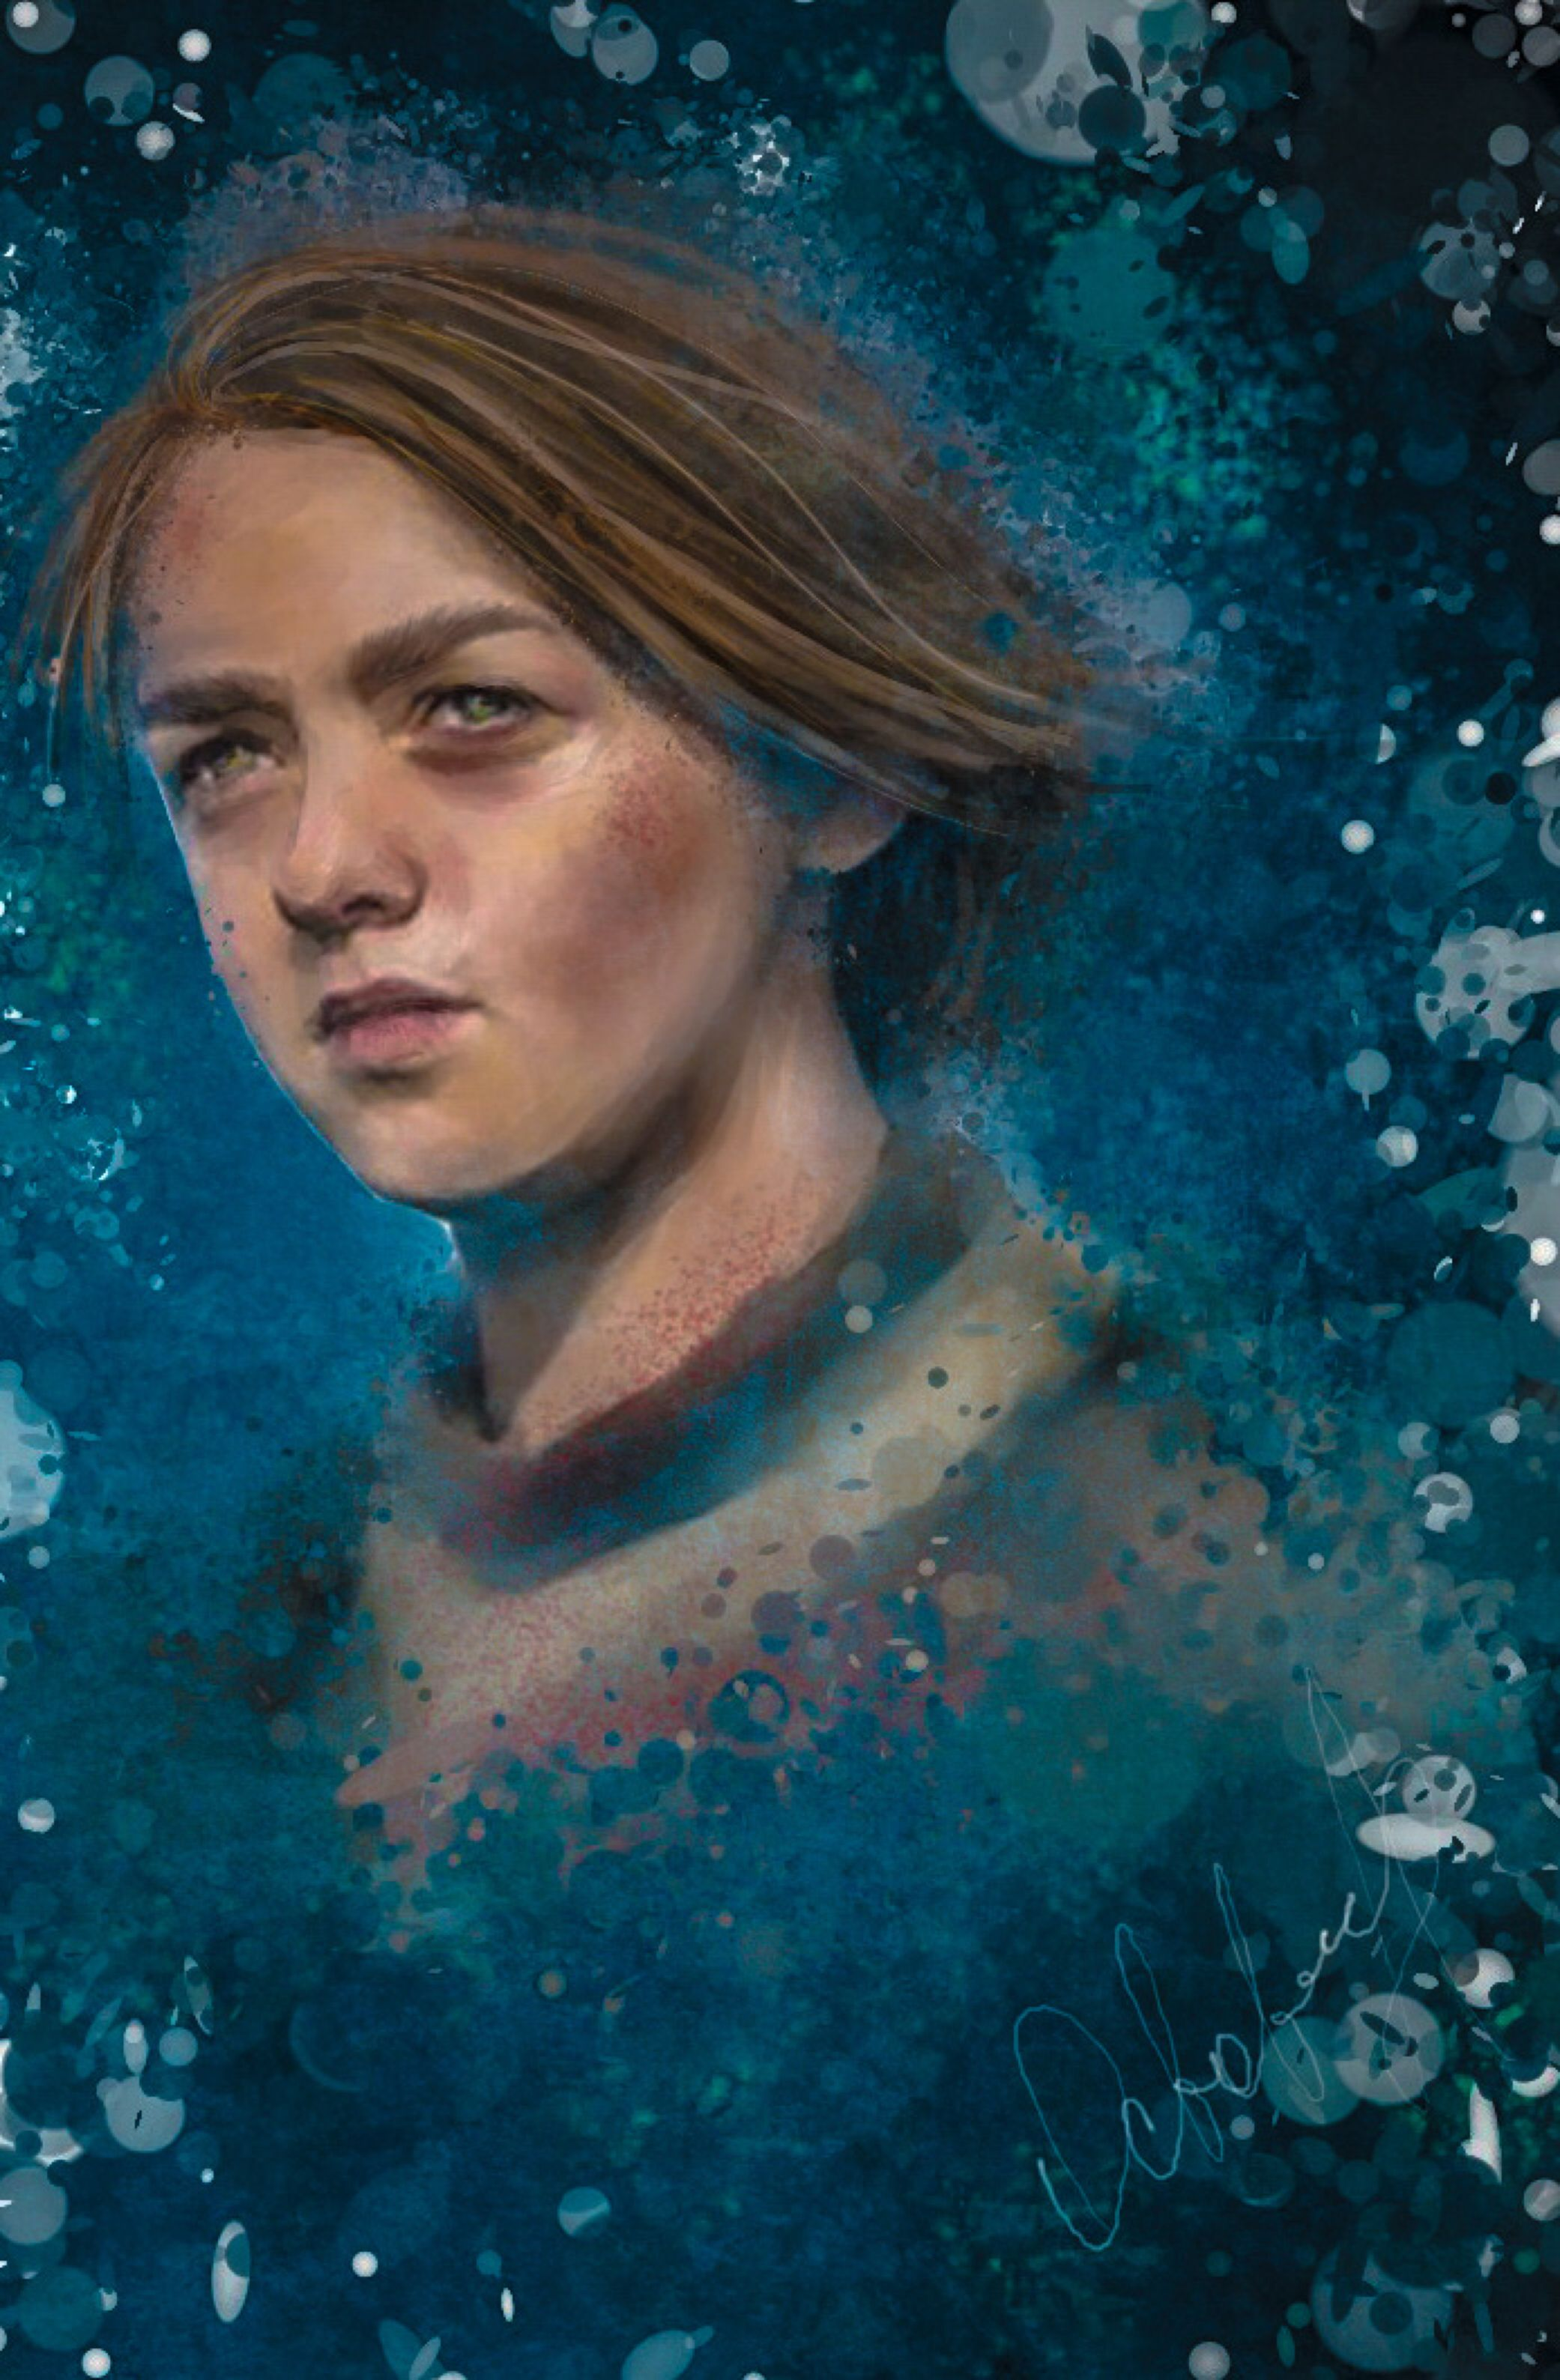 Arya Stark by Octoberrine on @DeviantArt